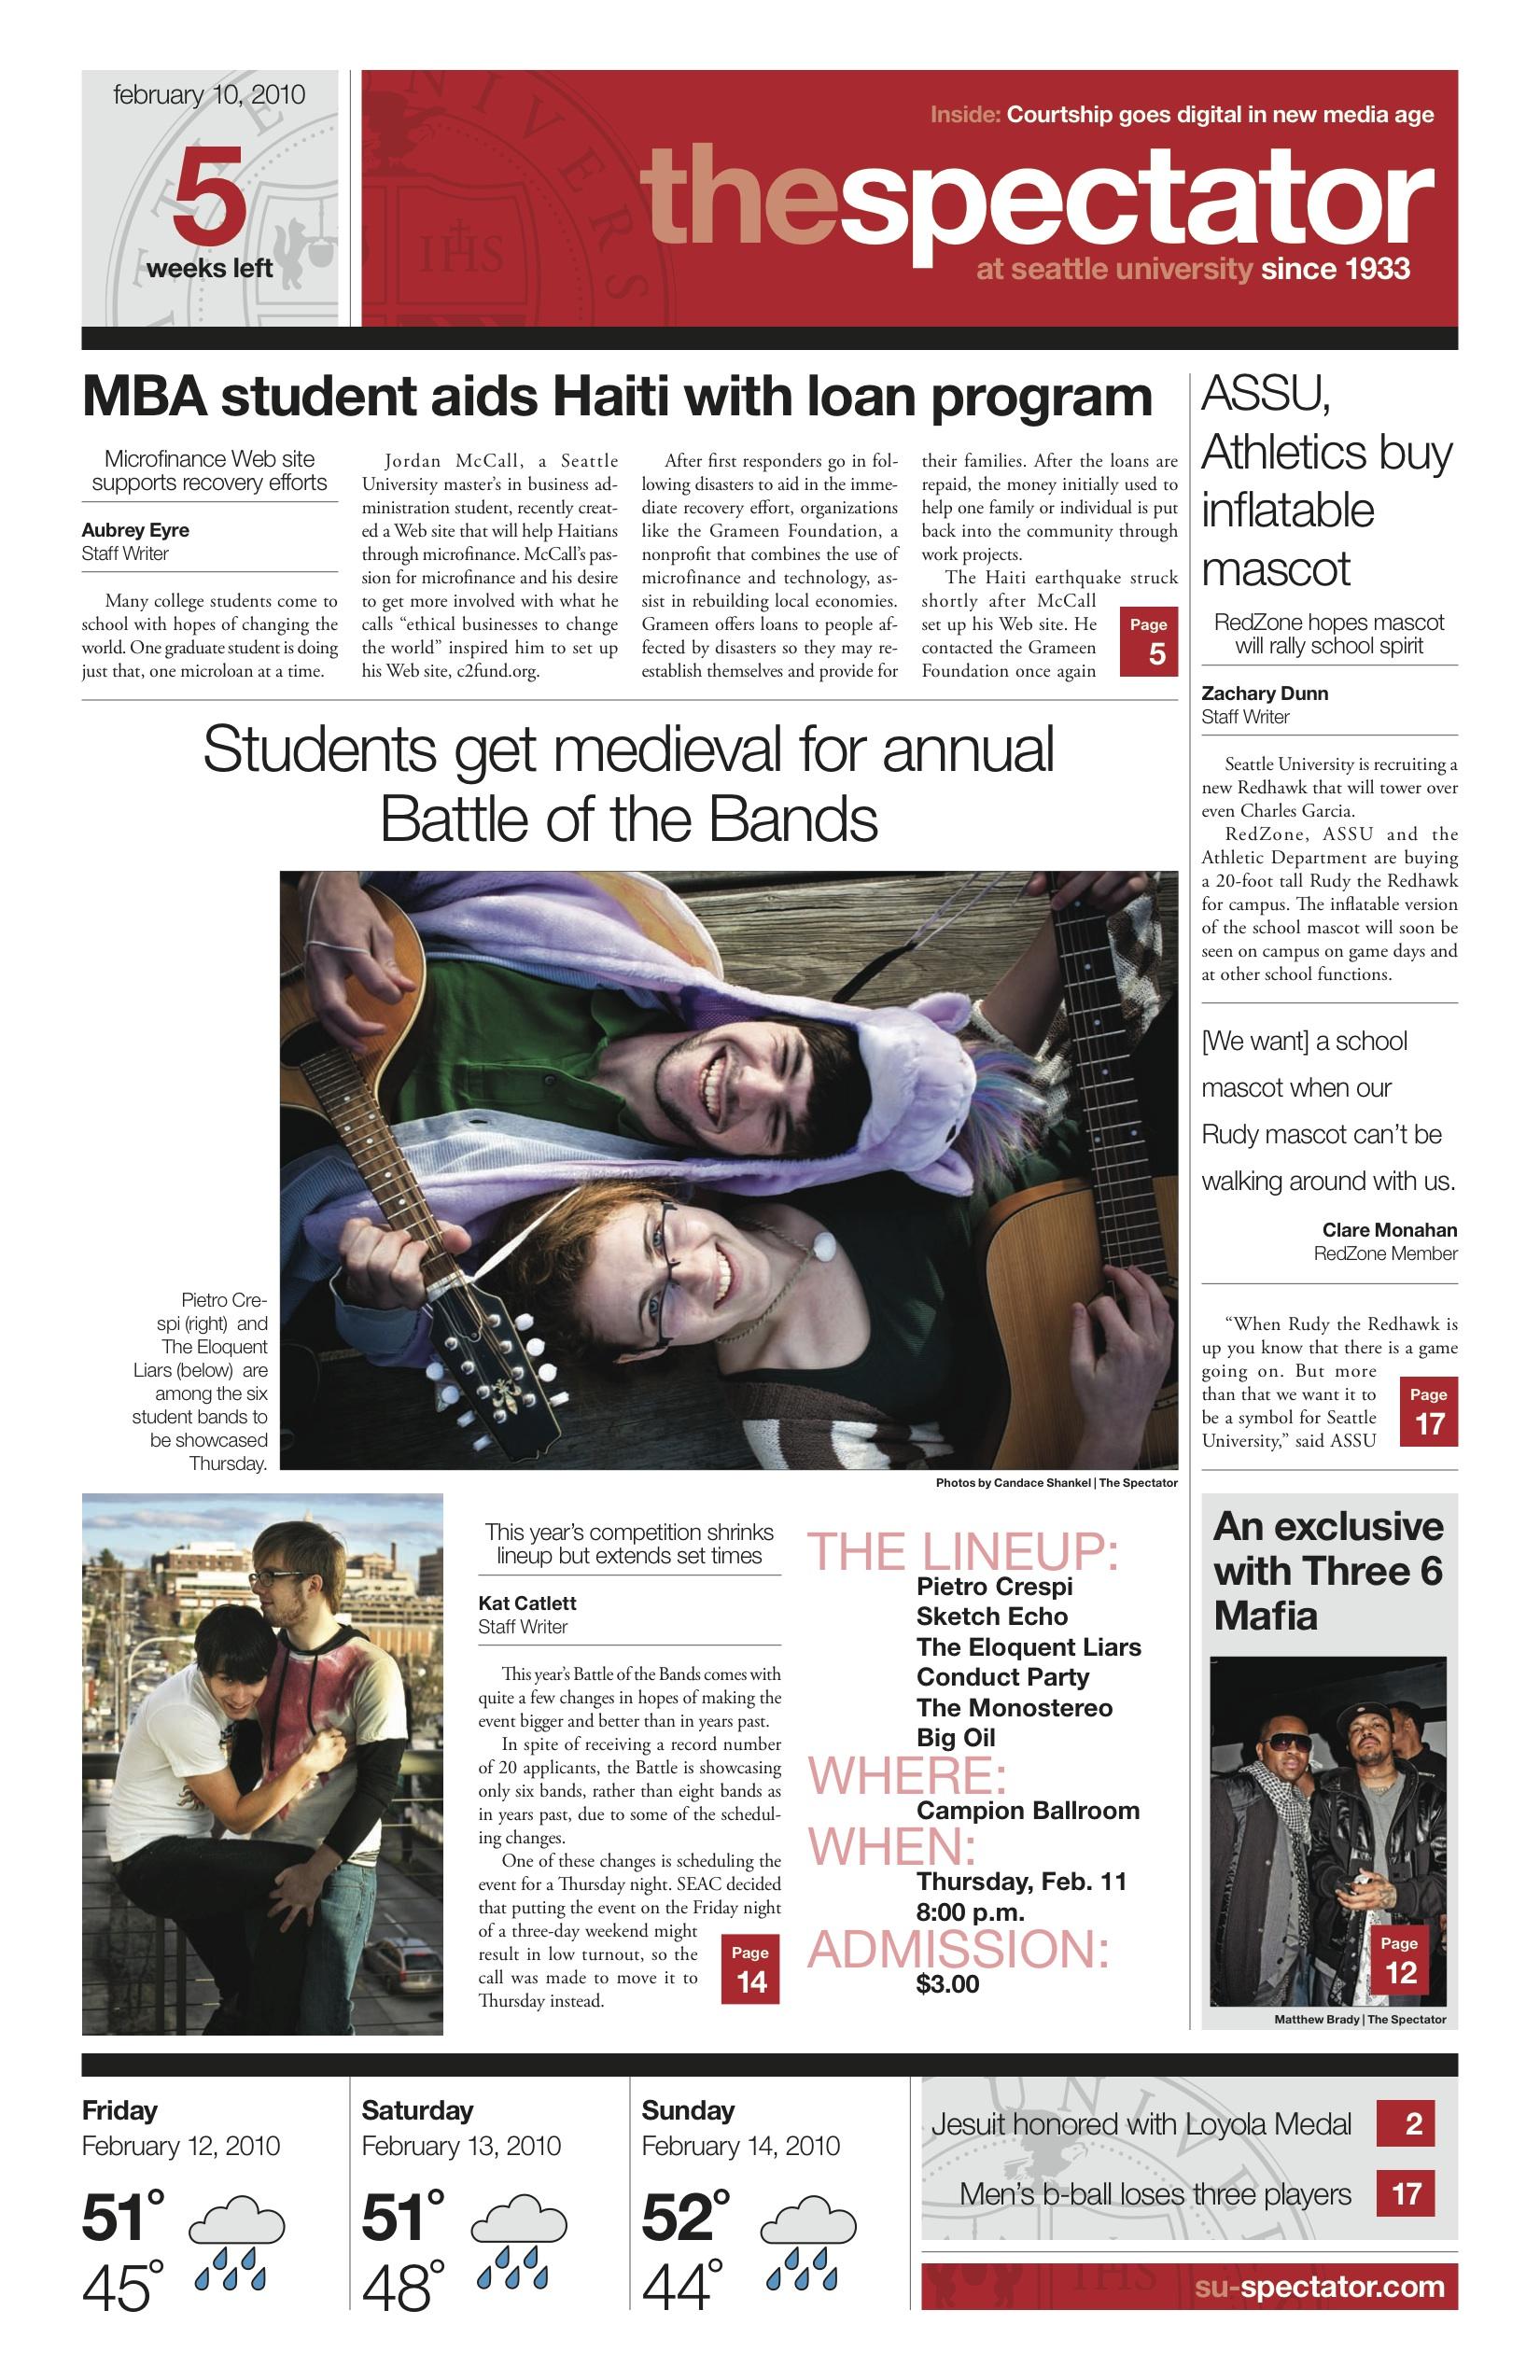 CandaceShankel_SeattleUniversity_Spectator_Cover_AlexBarr.jpg